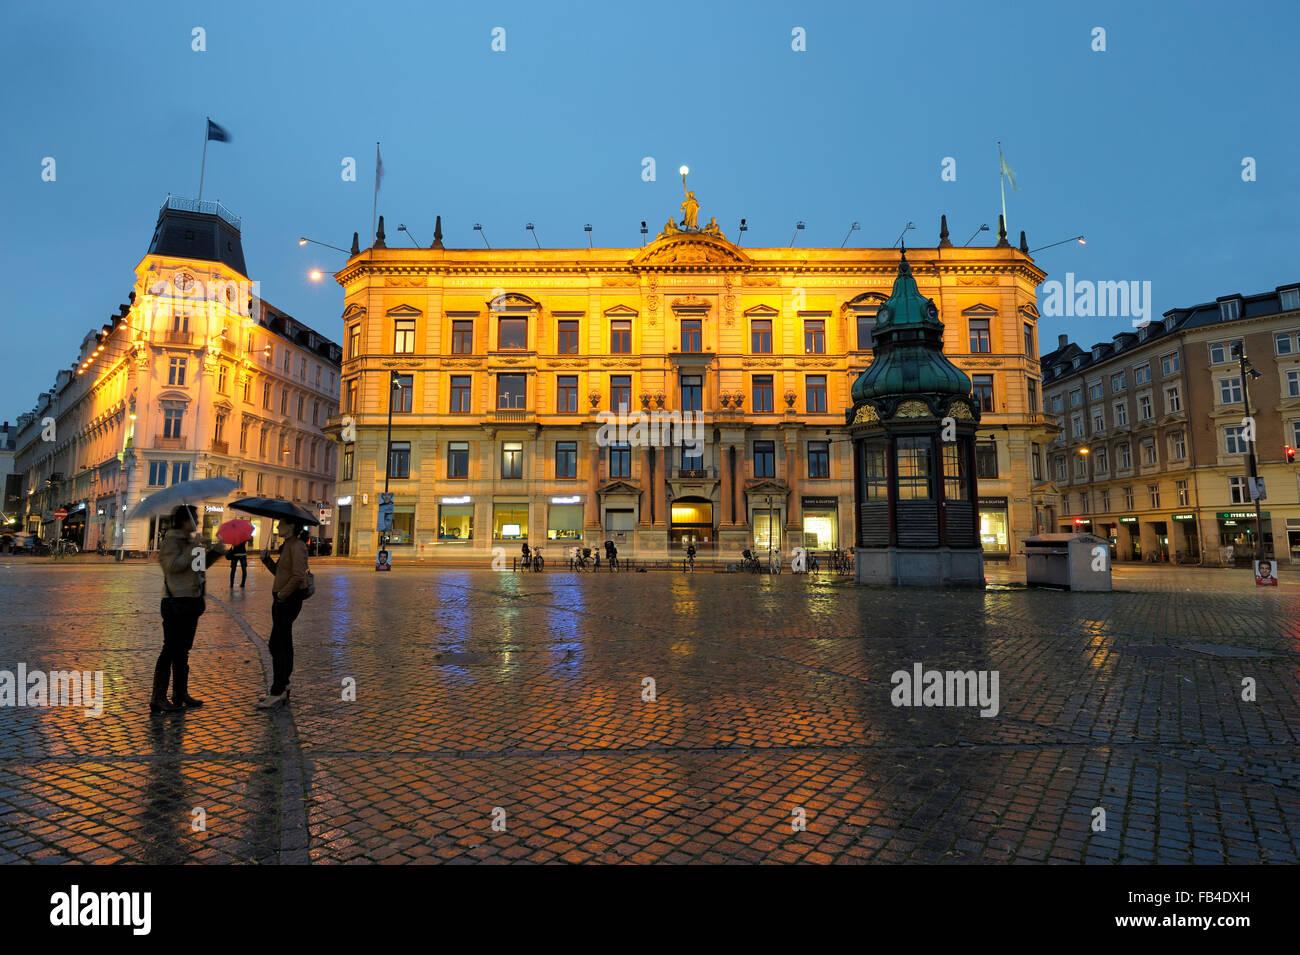 Nyhavn, Kobenhavn, Sjaelland (Zealand), Region Hovedstaden, Denmark - Stock Image